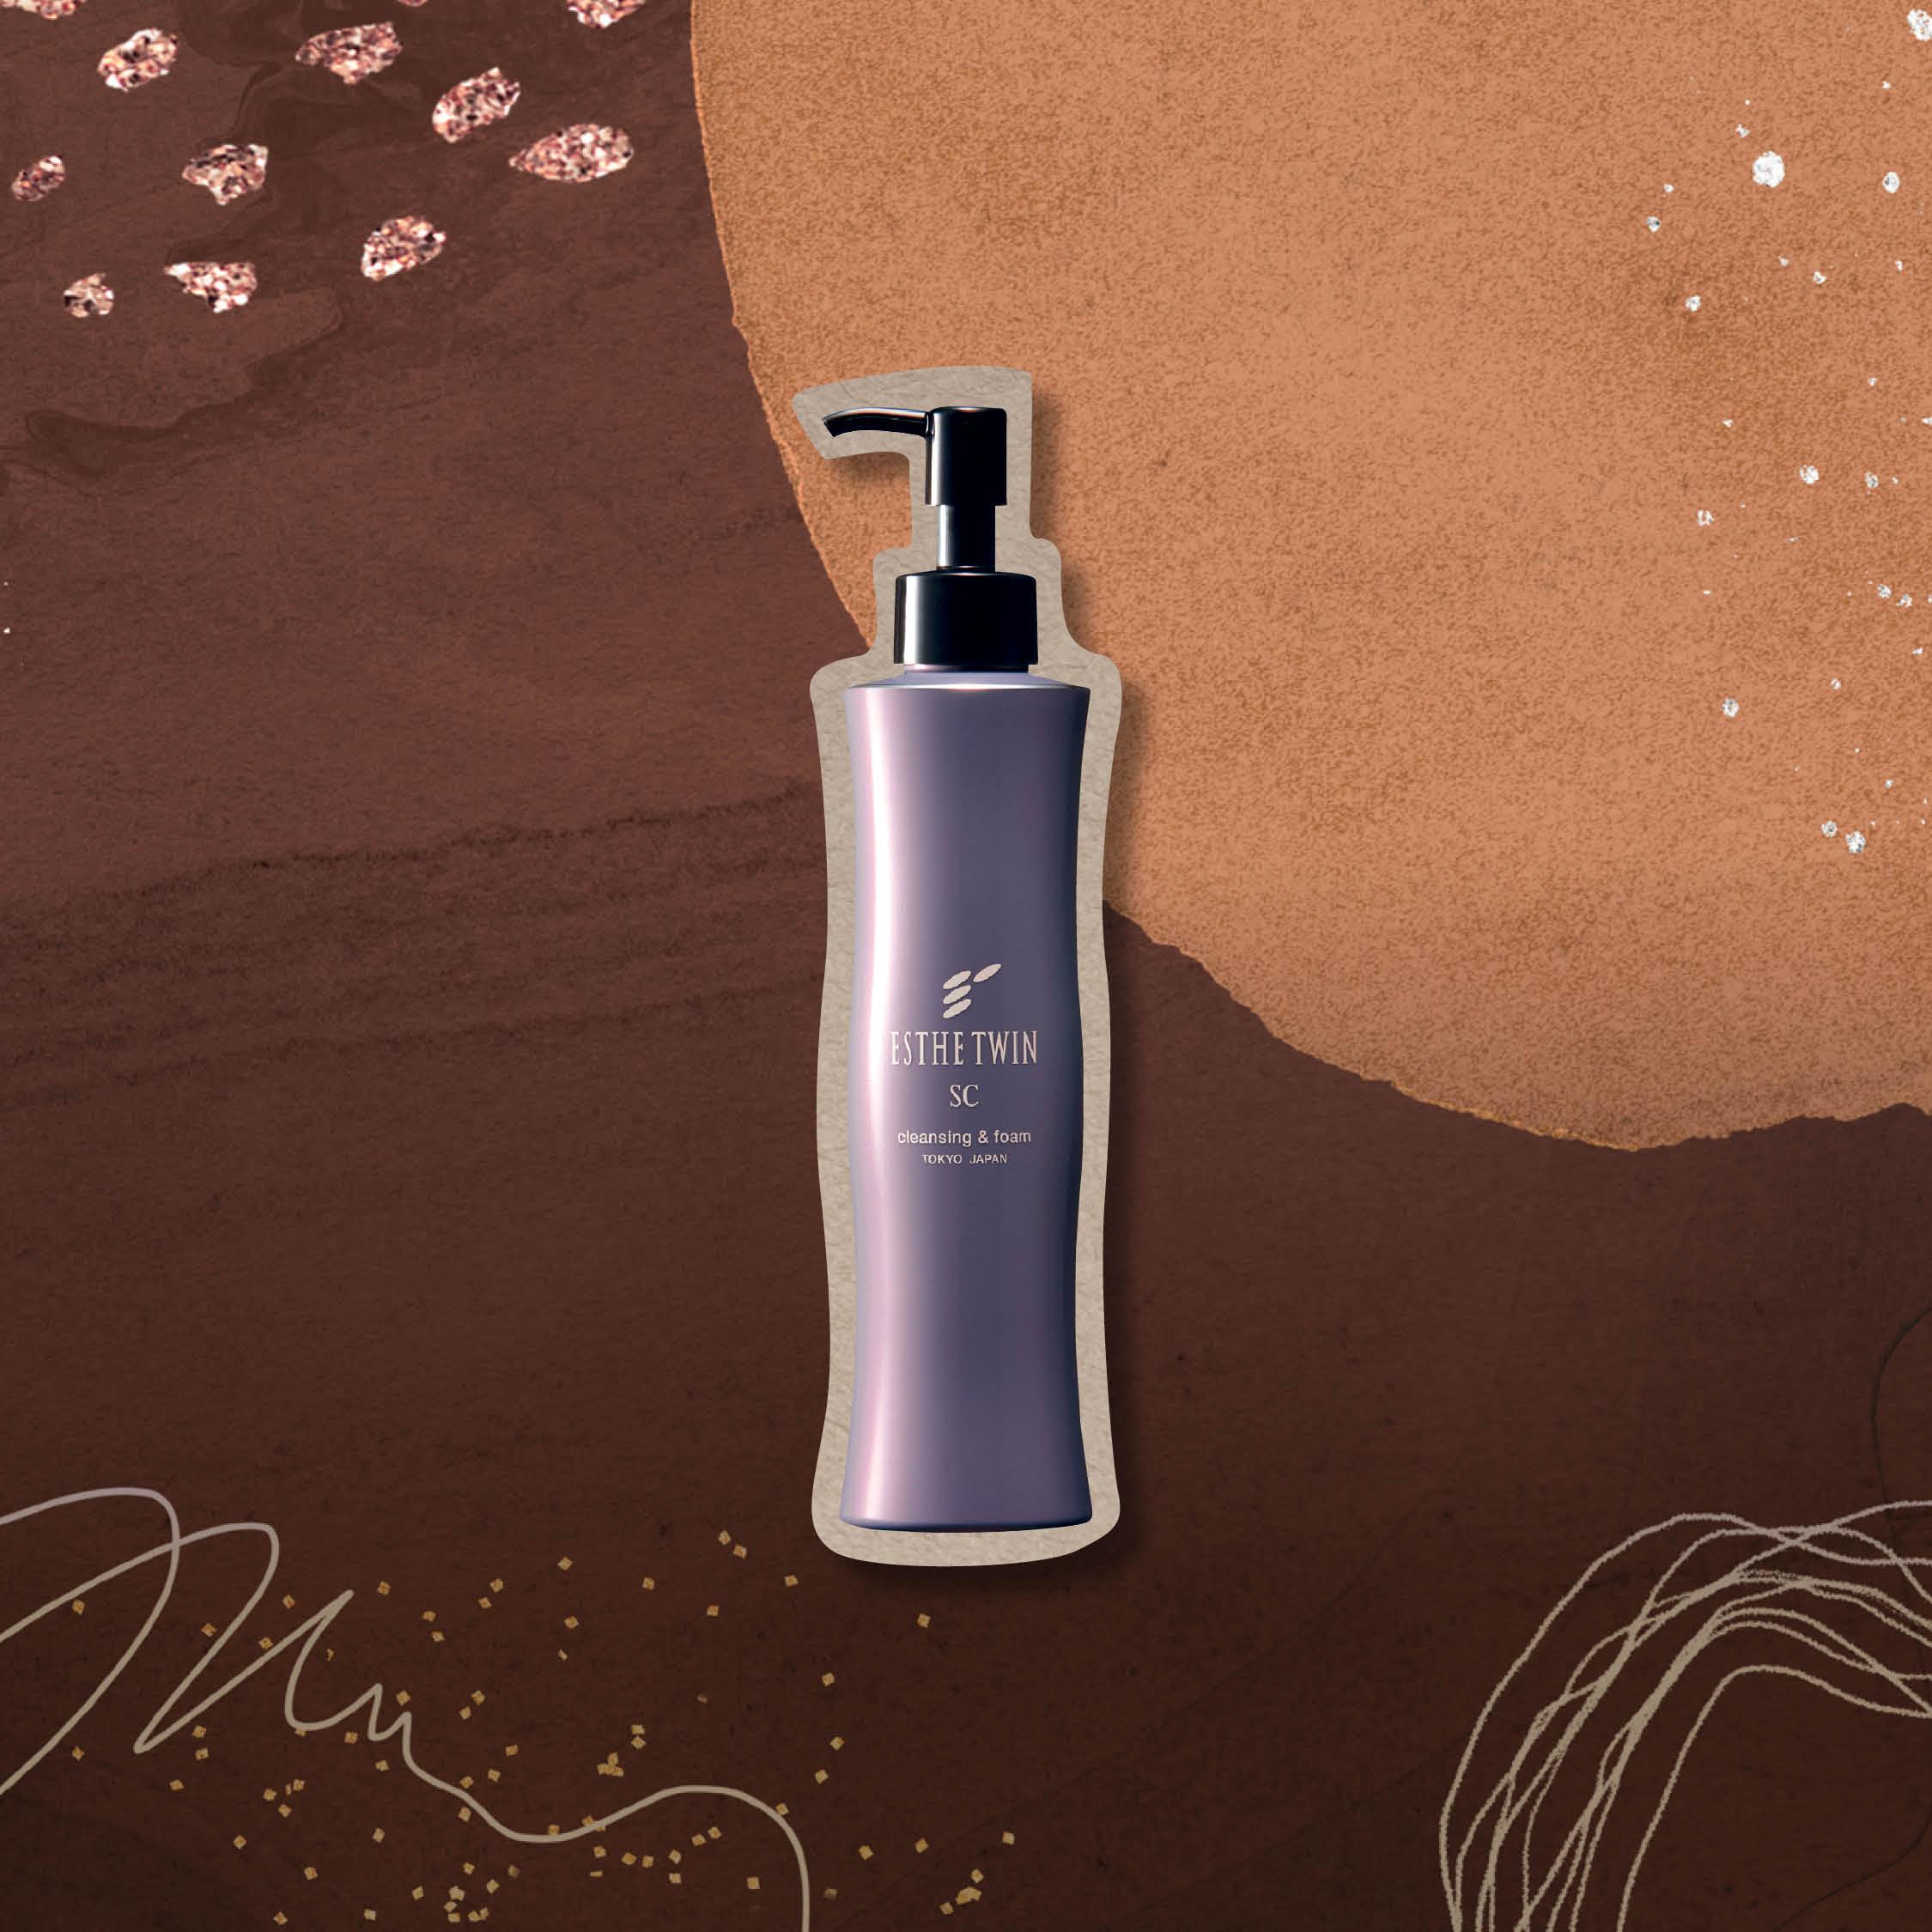 Grooming Awards 2020 - Best Cleanser for Dry Skin. Art Direction: Jonathan Tai